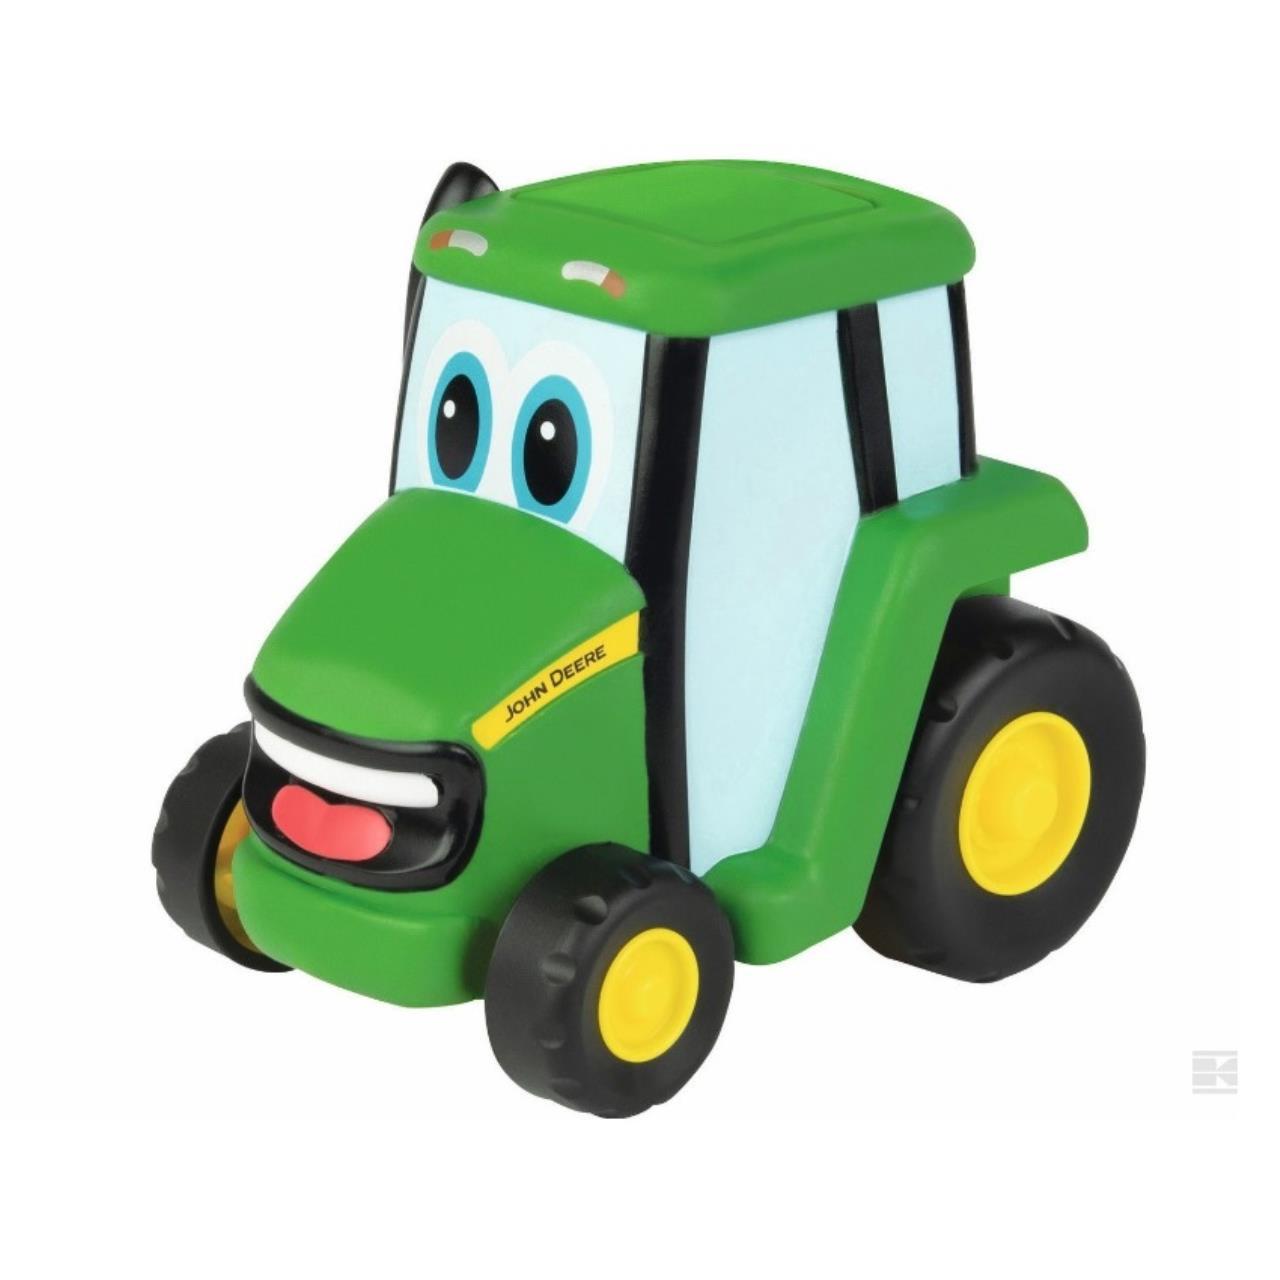 Skub og kør Johnny Traktor